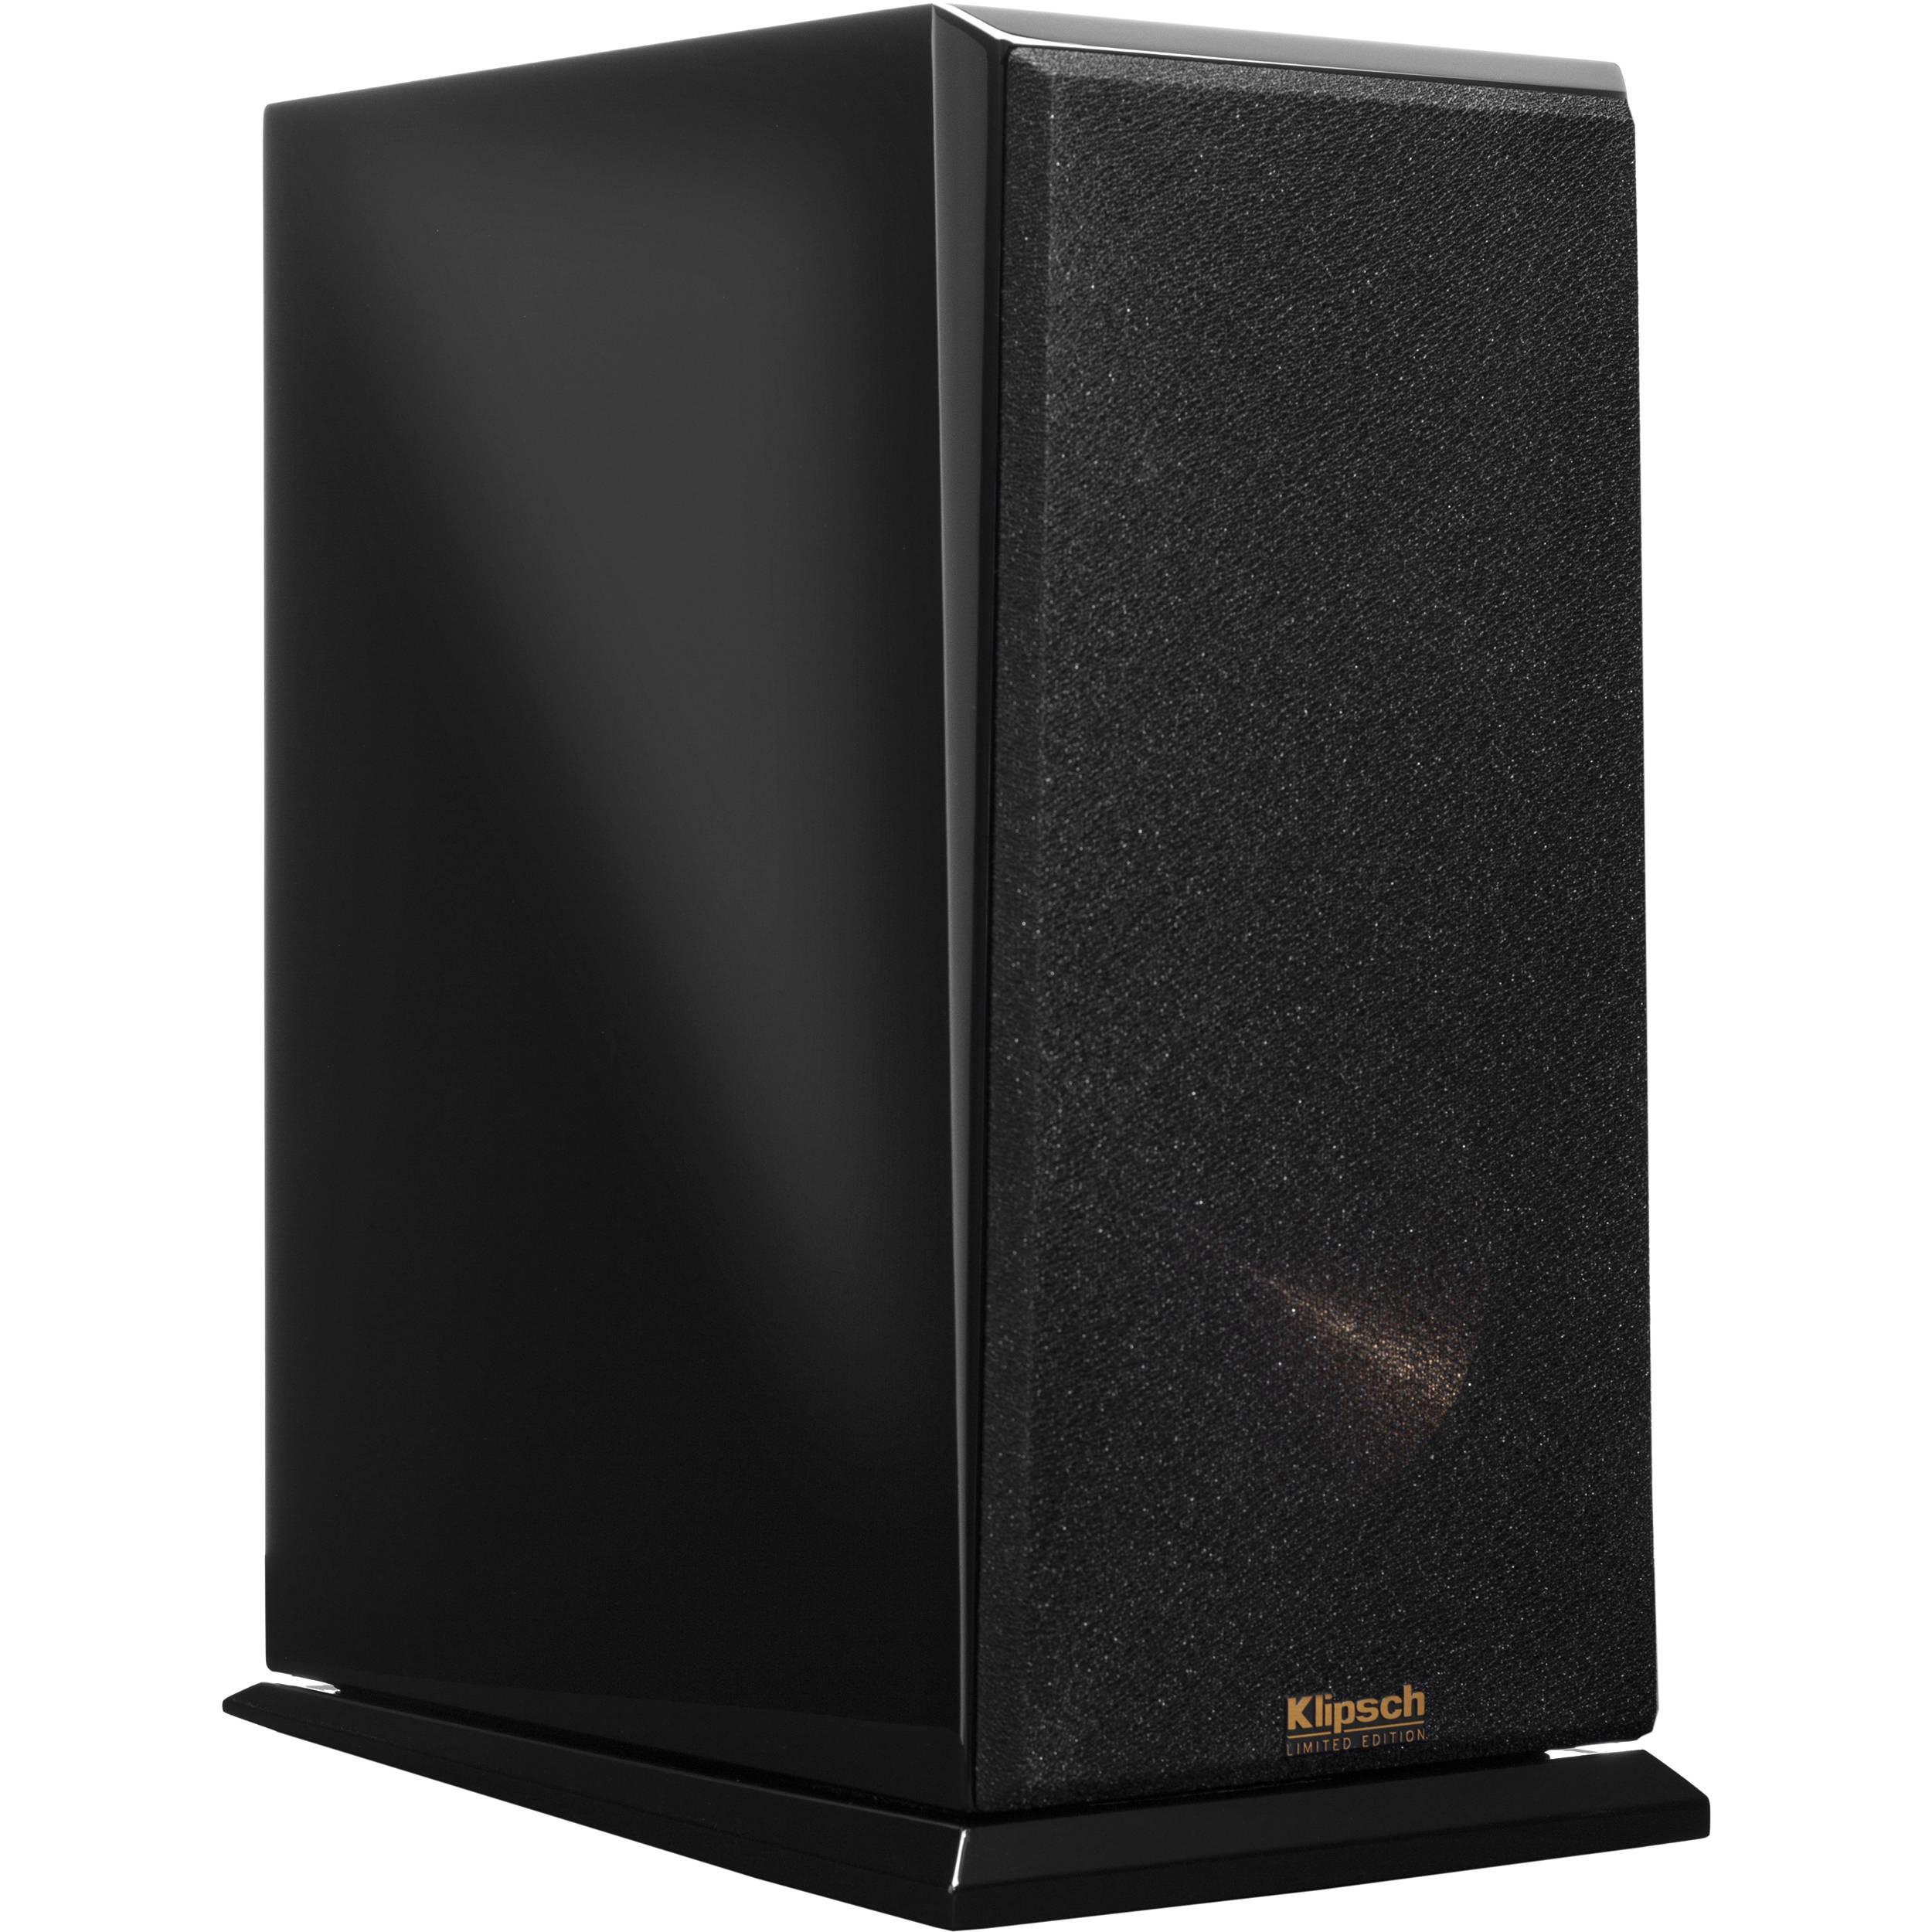 audio bookshelf reviews pr cambridge products stereo way executive speakers